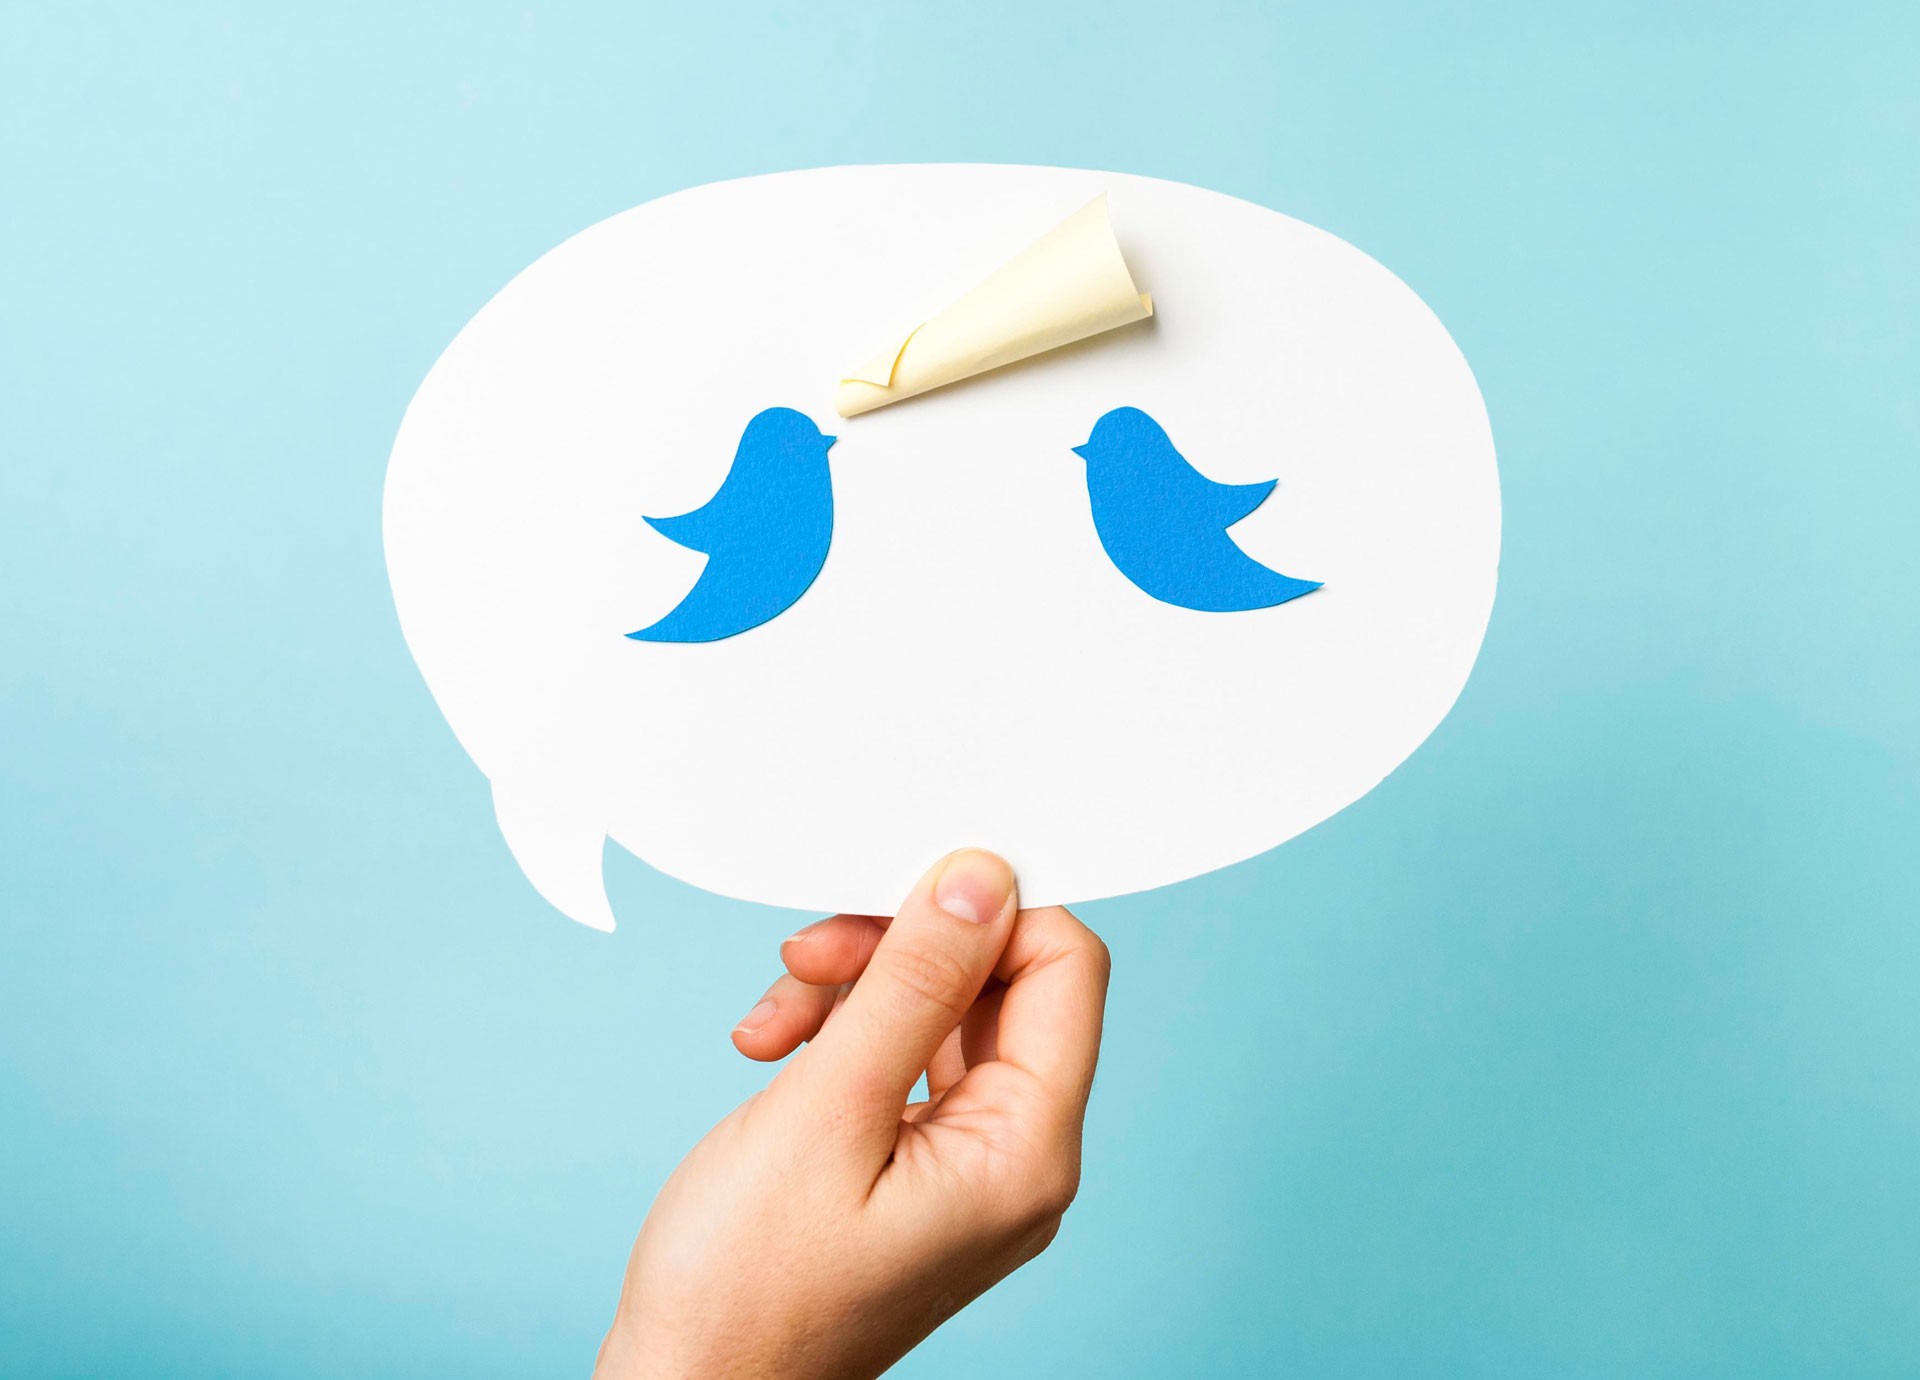 Twitter aplica cambio para ahorrar caracteres